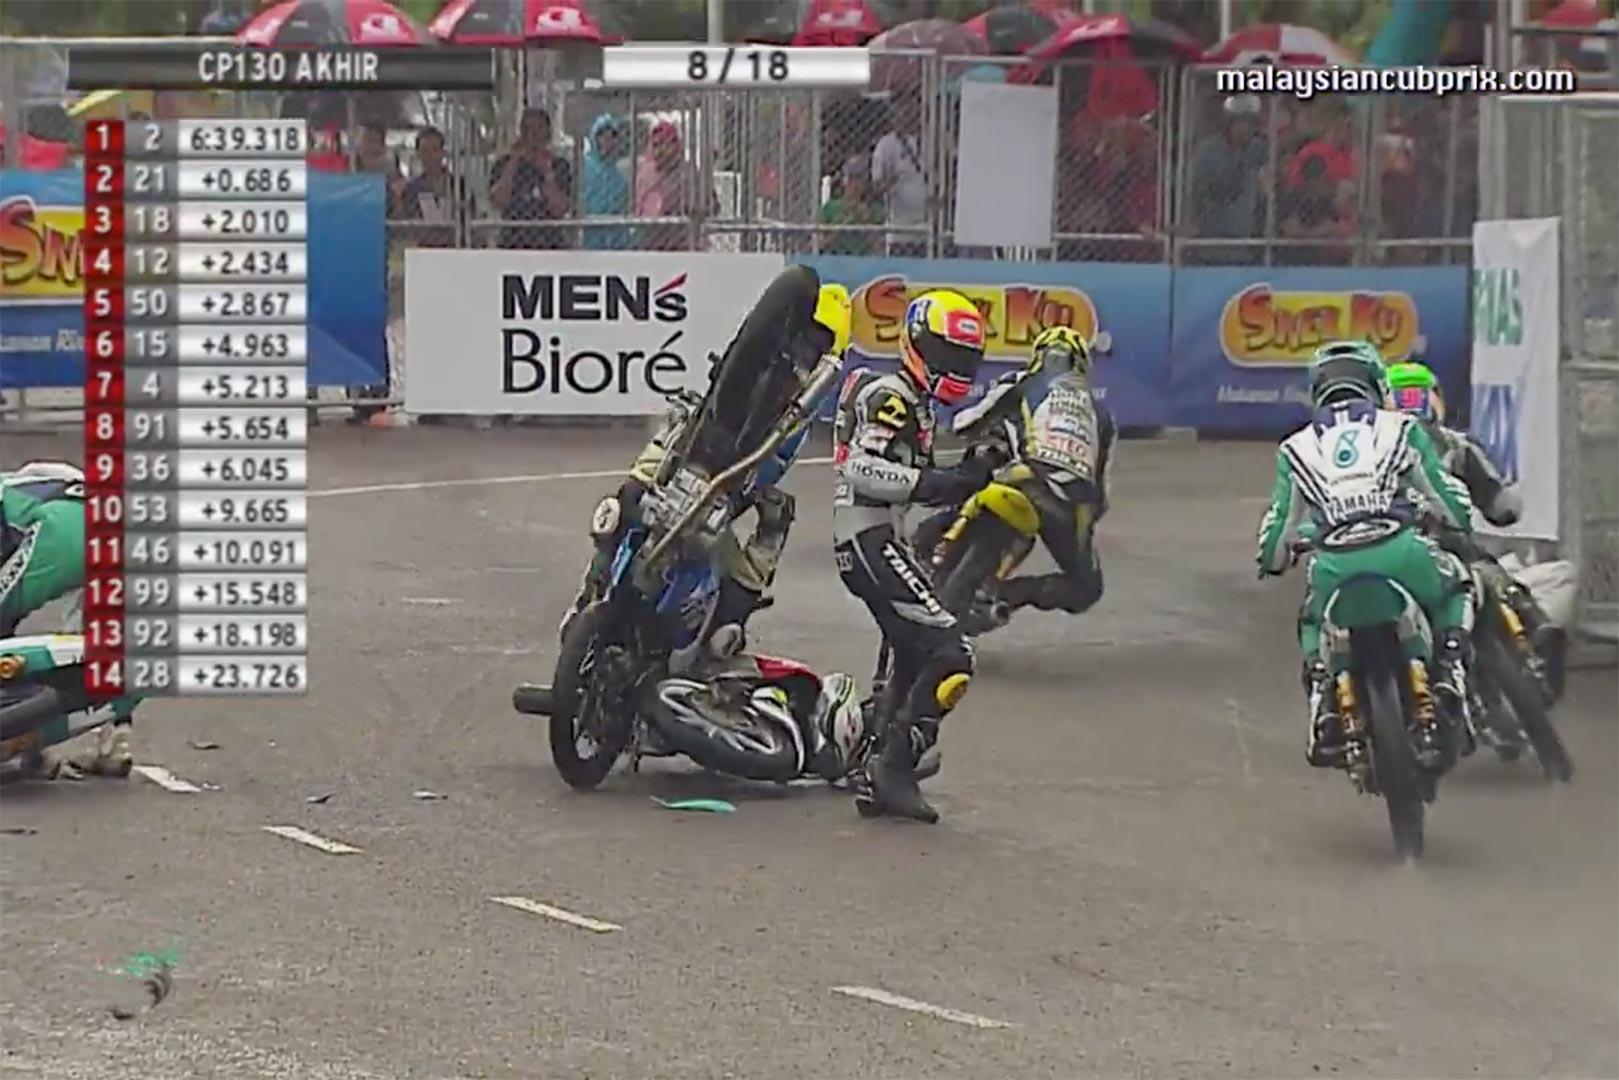 Motogp Biggest Crashes | MotoGP 2017 Info, Video, Points Table